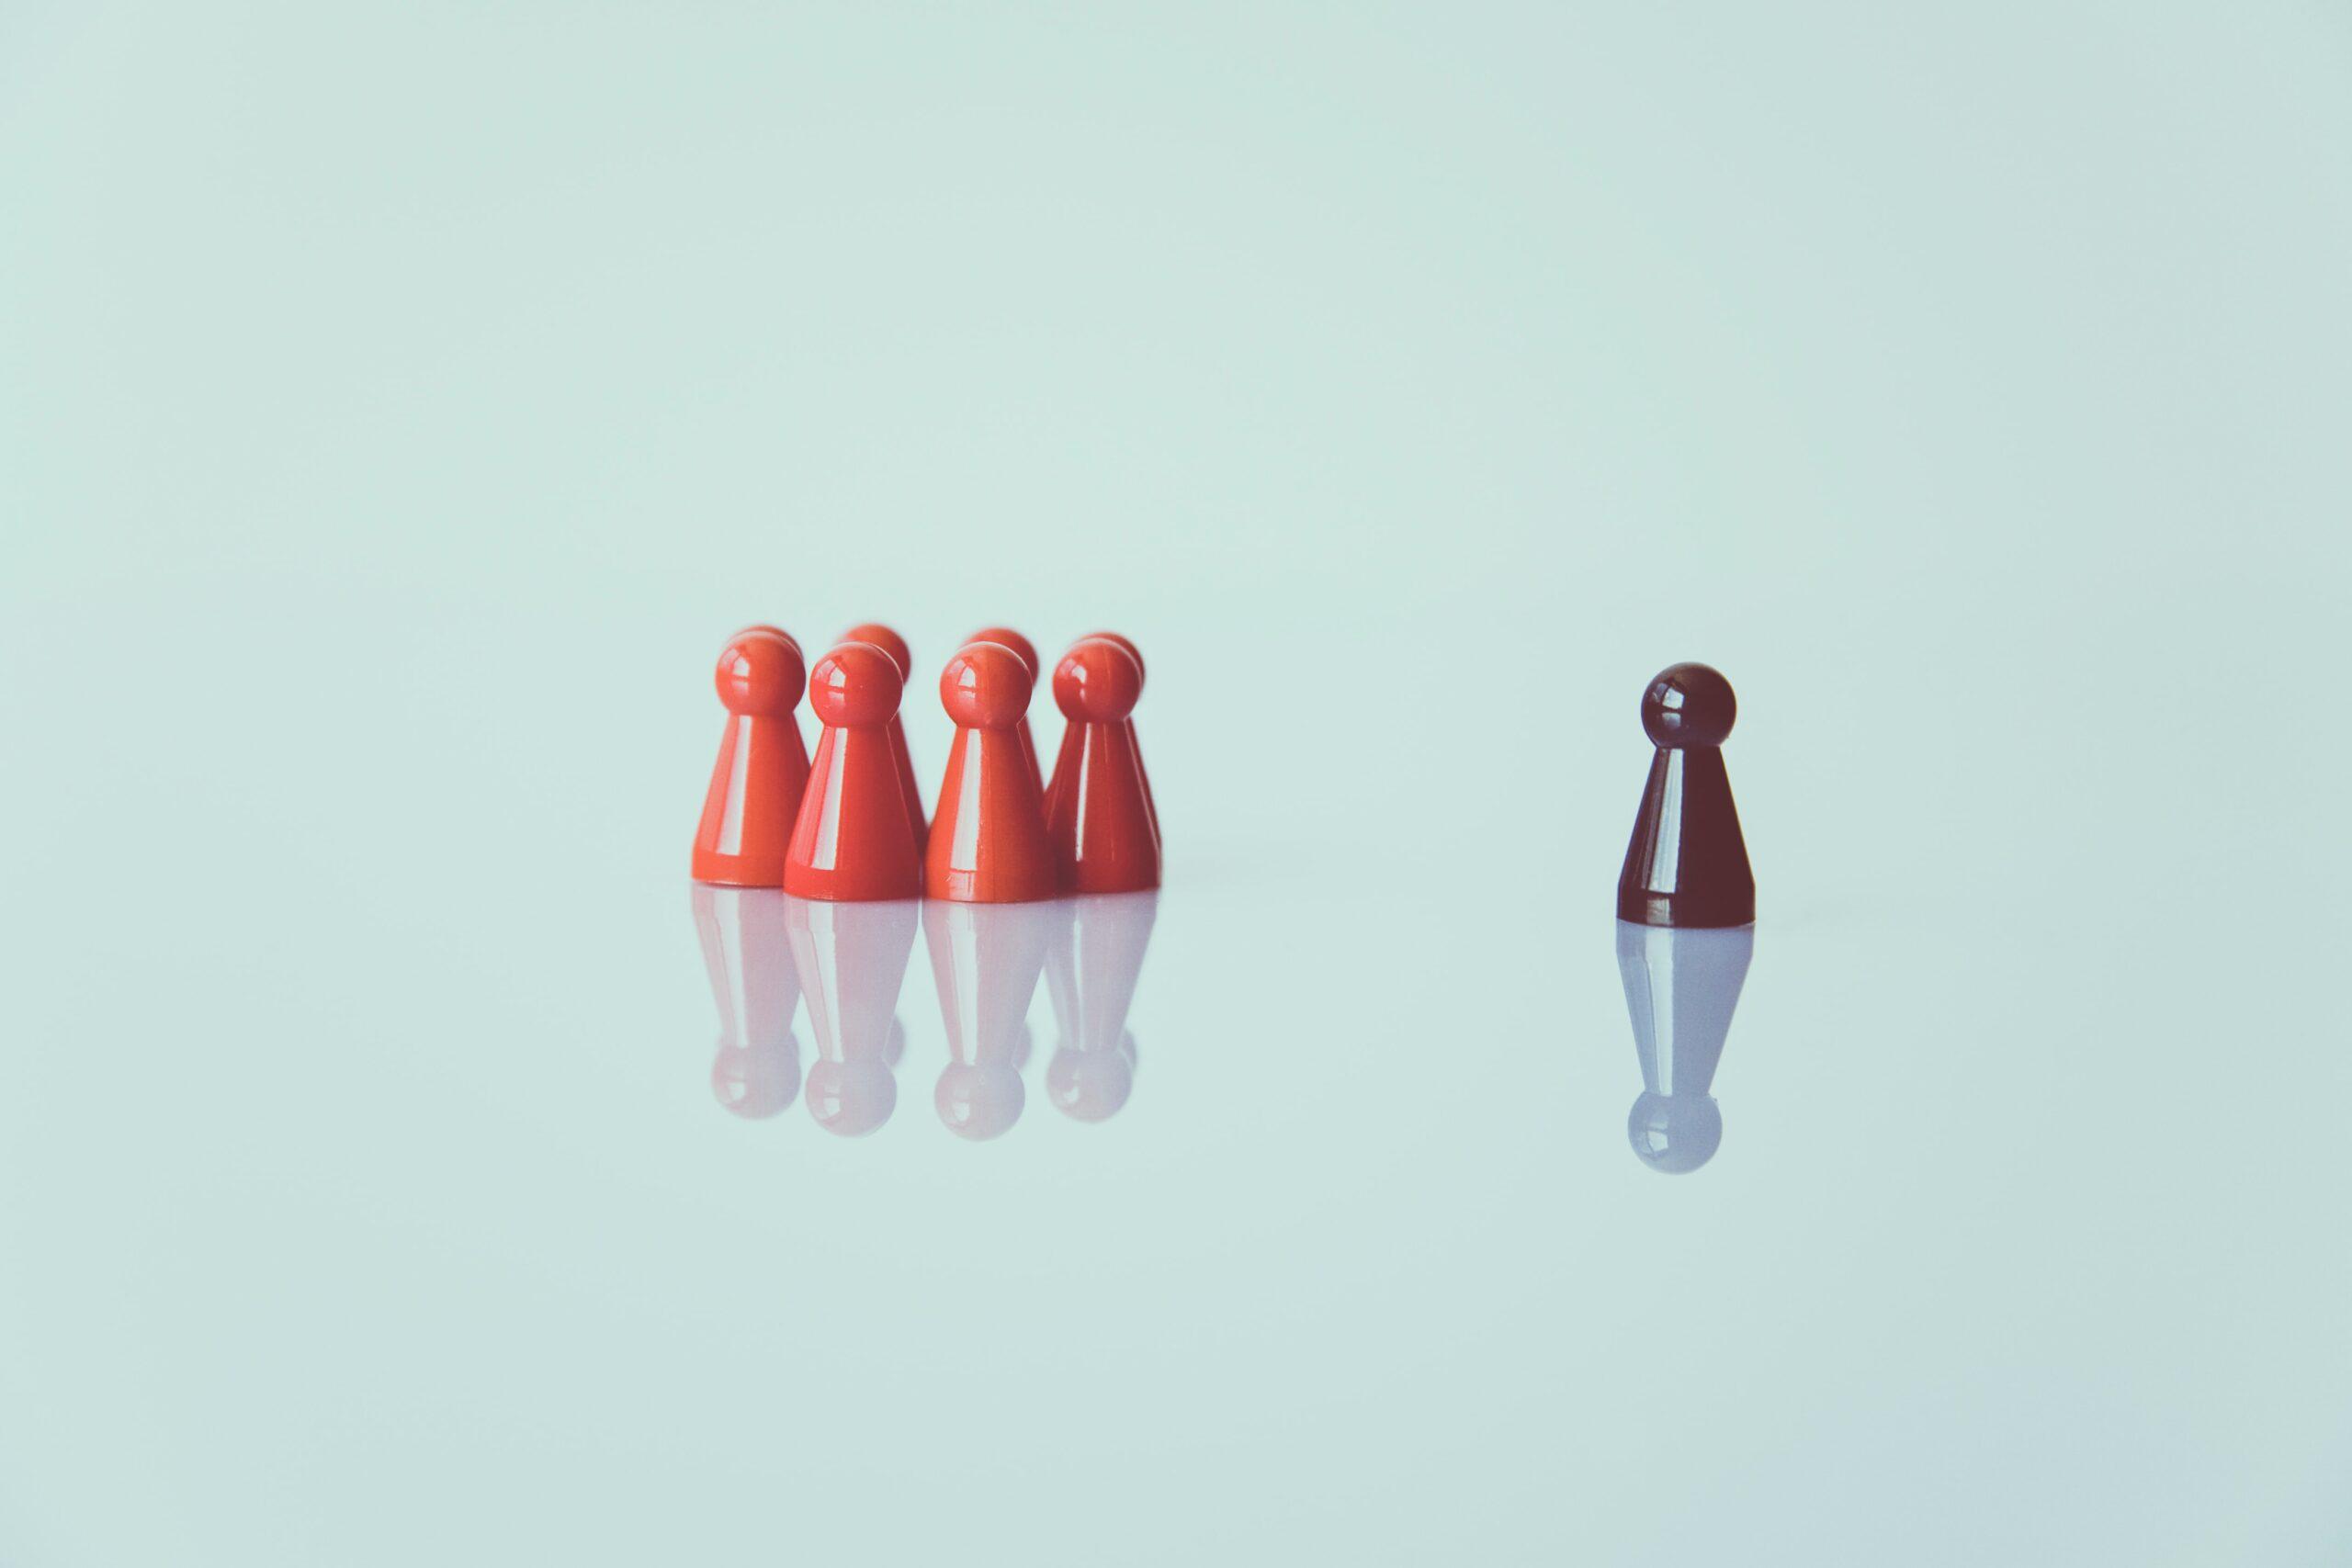 Three Steps CEO's Must Take to Reduce Racial Bias